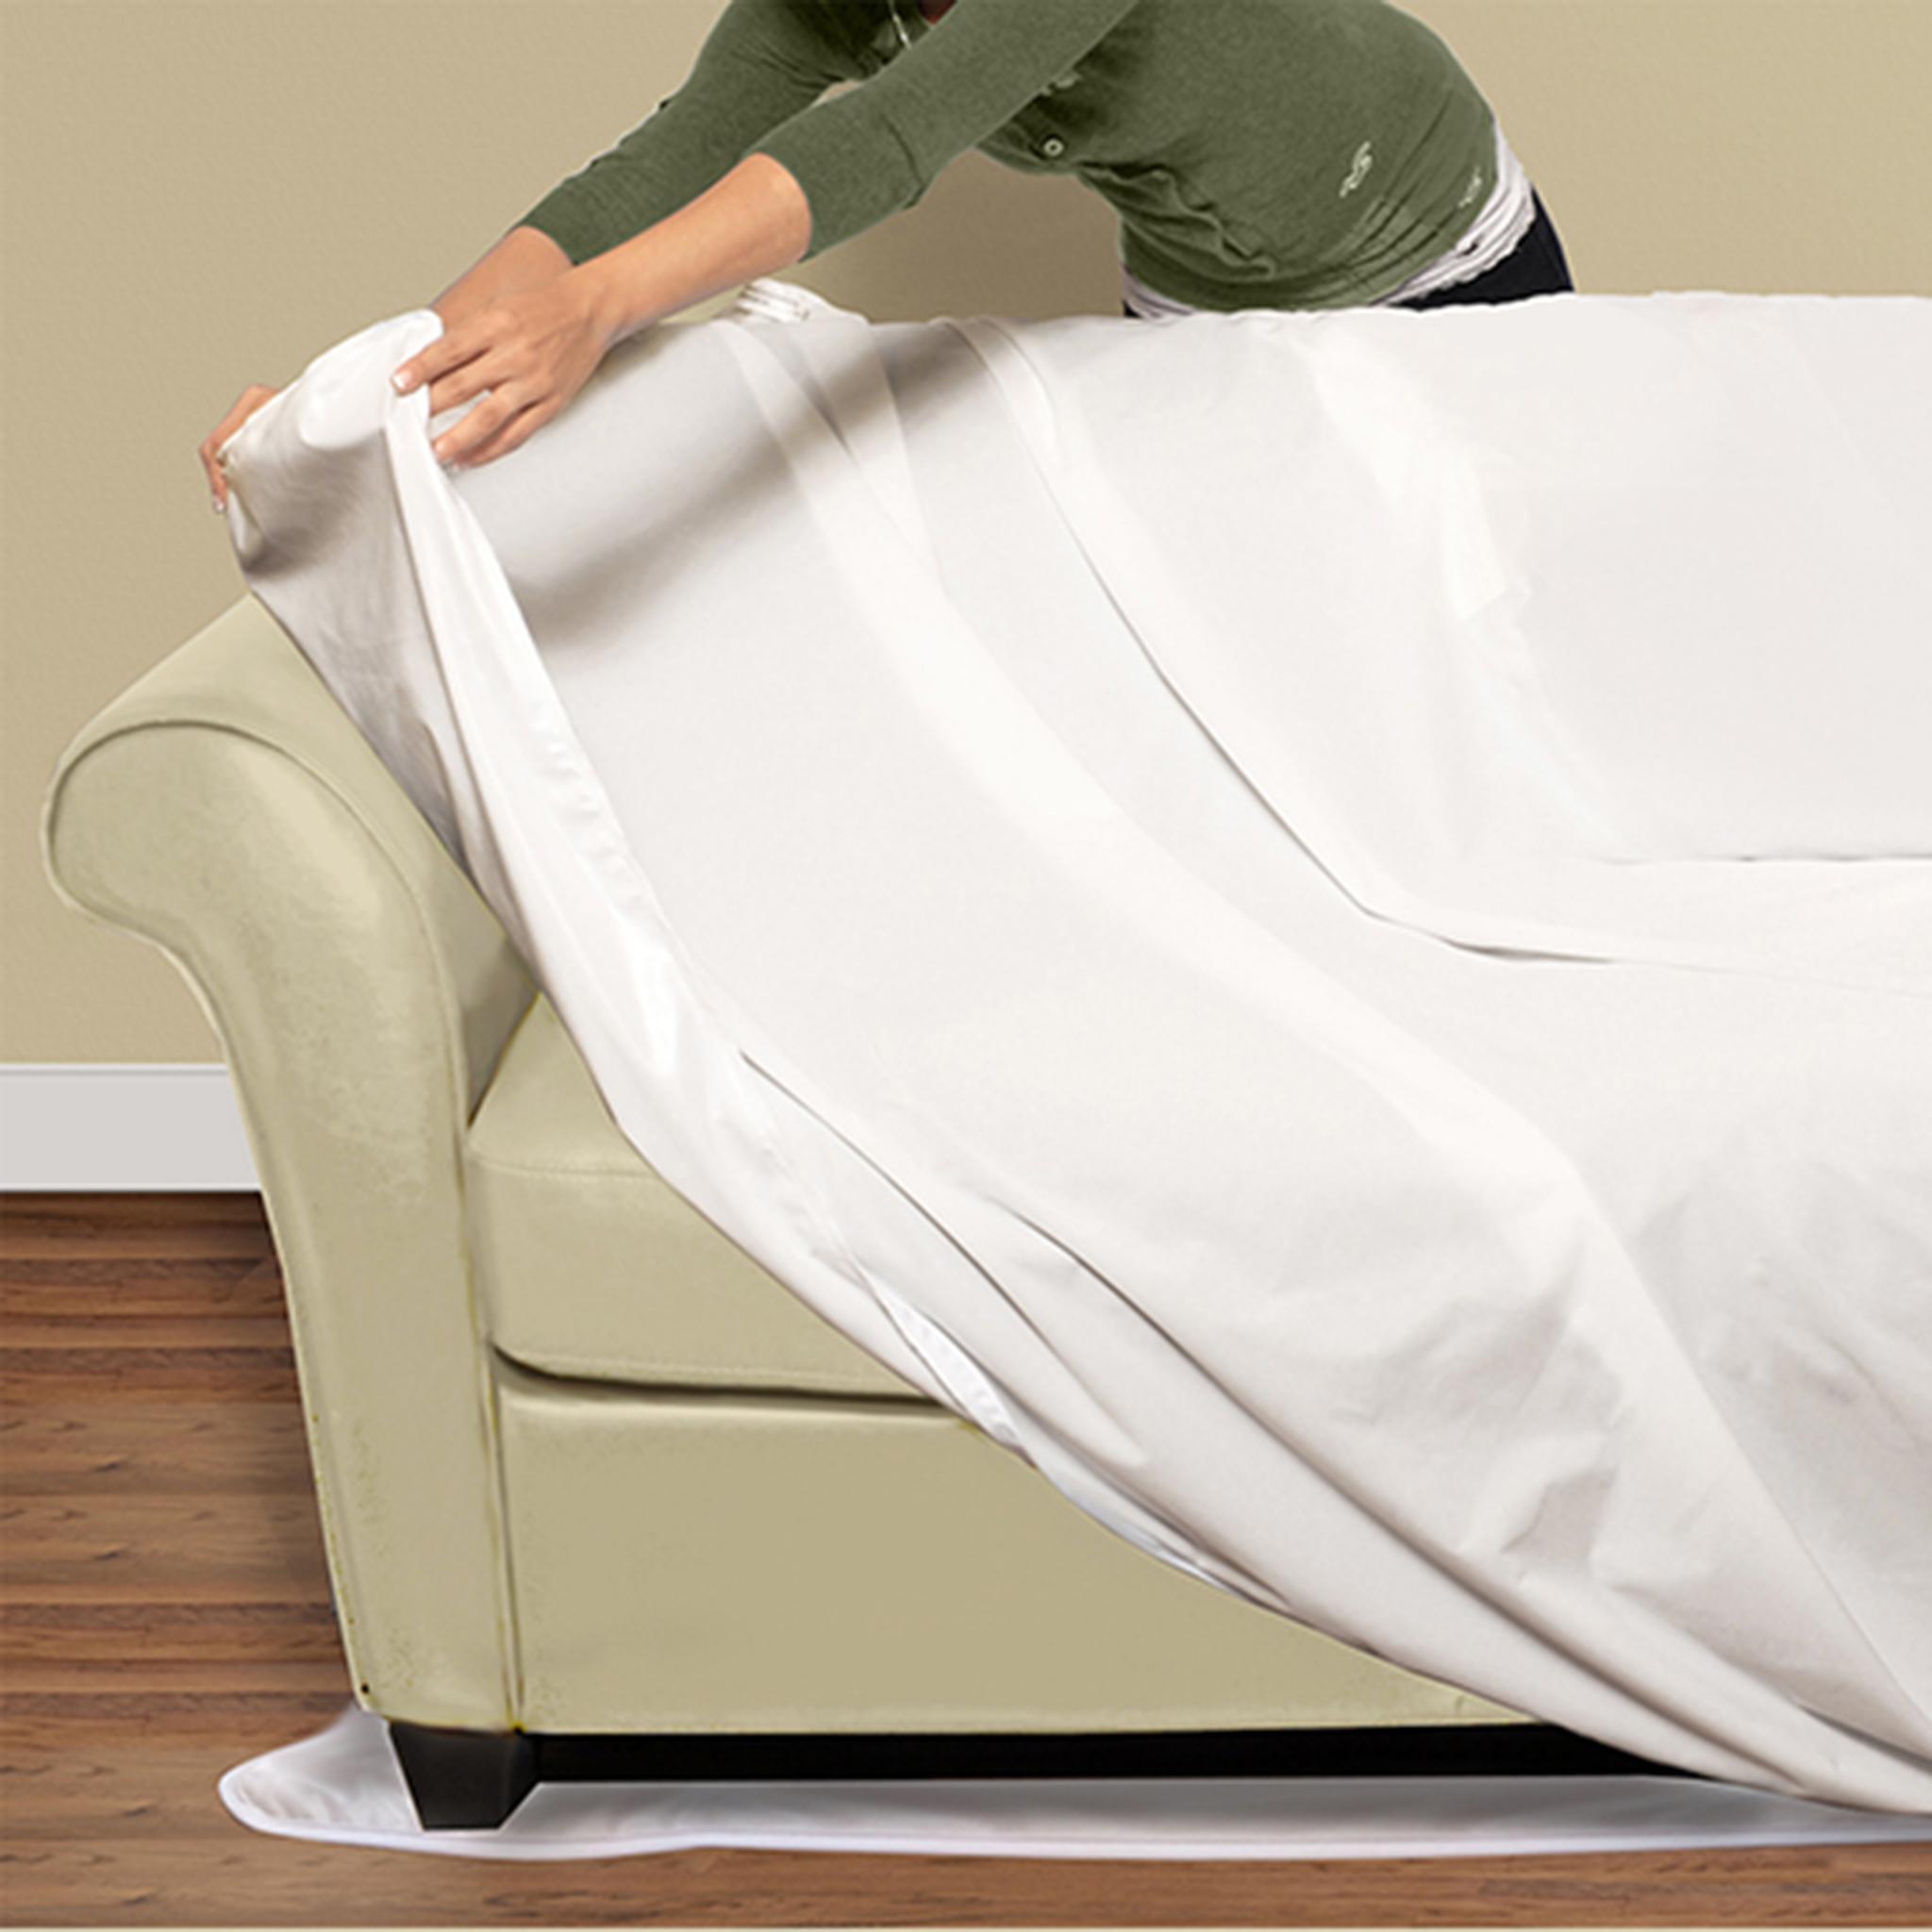 sofa gun safe home 3 seater rattan effect mini corner instructions mattress 39s furnituresafe encasement curved